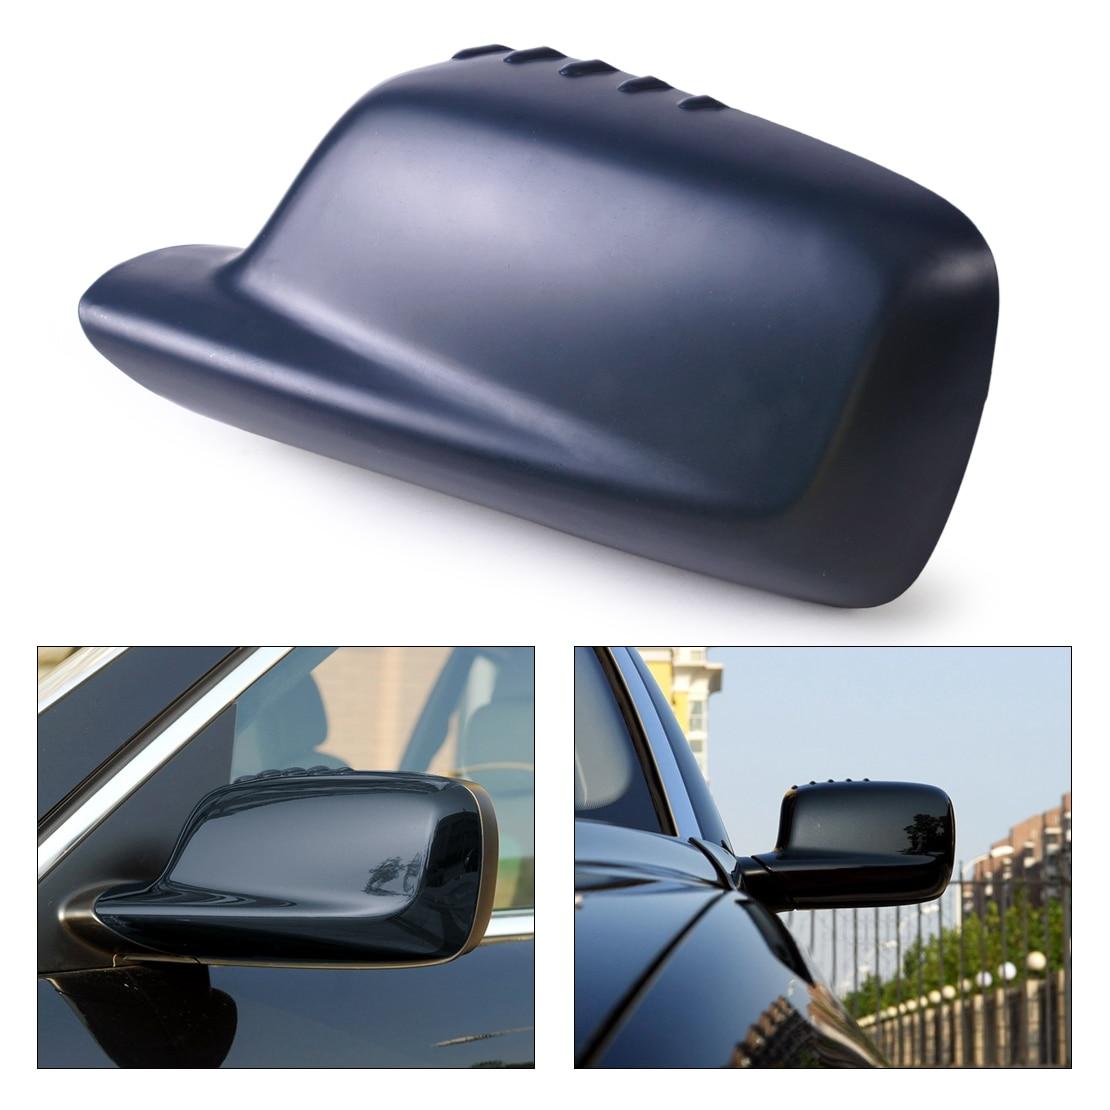 beler New Arrival 1Pc Left Door Mirror Cover Cap Case 51167074235 Fit for BMW E46 E65 E66 330Ci 323Ci 325Ci 745i 750i 750Li 760i for bmw e65 e66 7 series oem front window windshield wiper blade set new 745i b7 oe 61 61 0 442 837 new